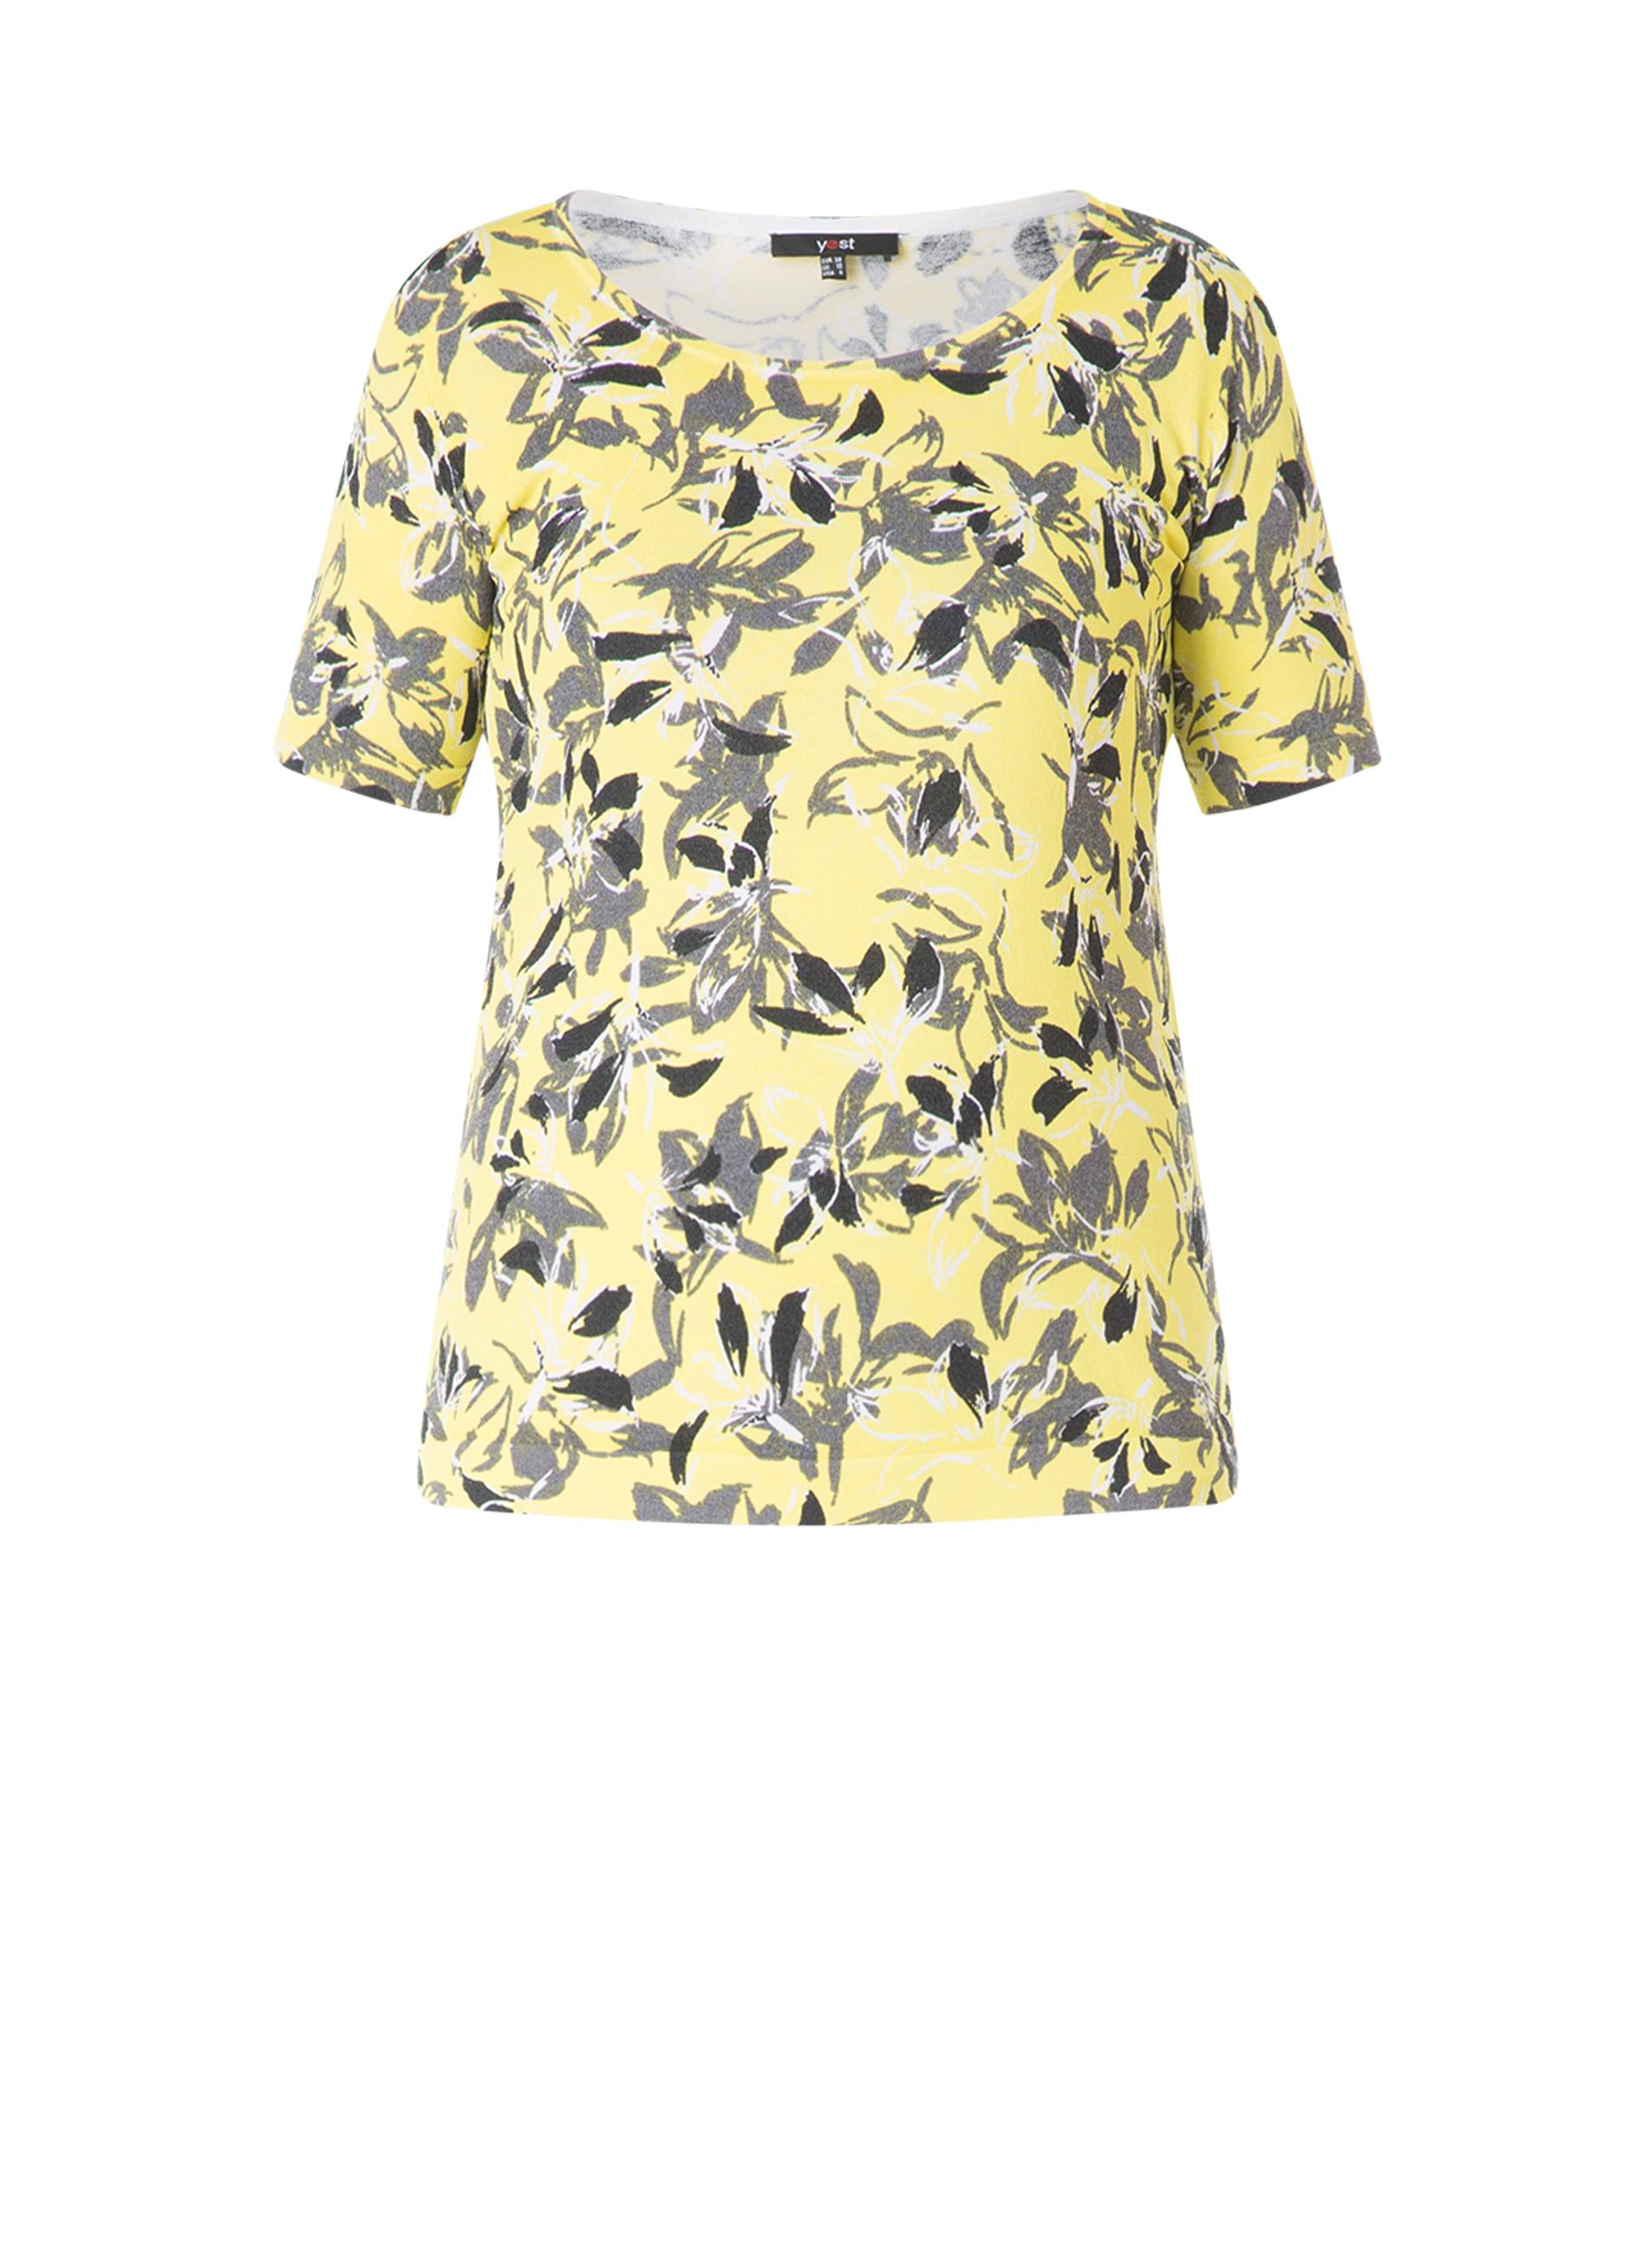 Shirt Yesta Jiselle print 64 CM